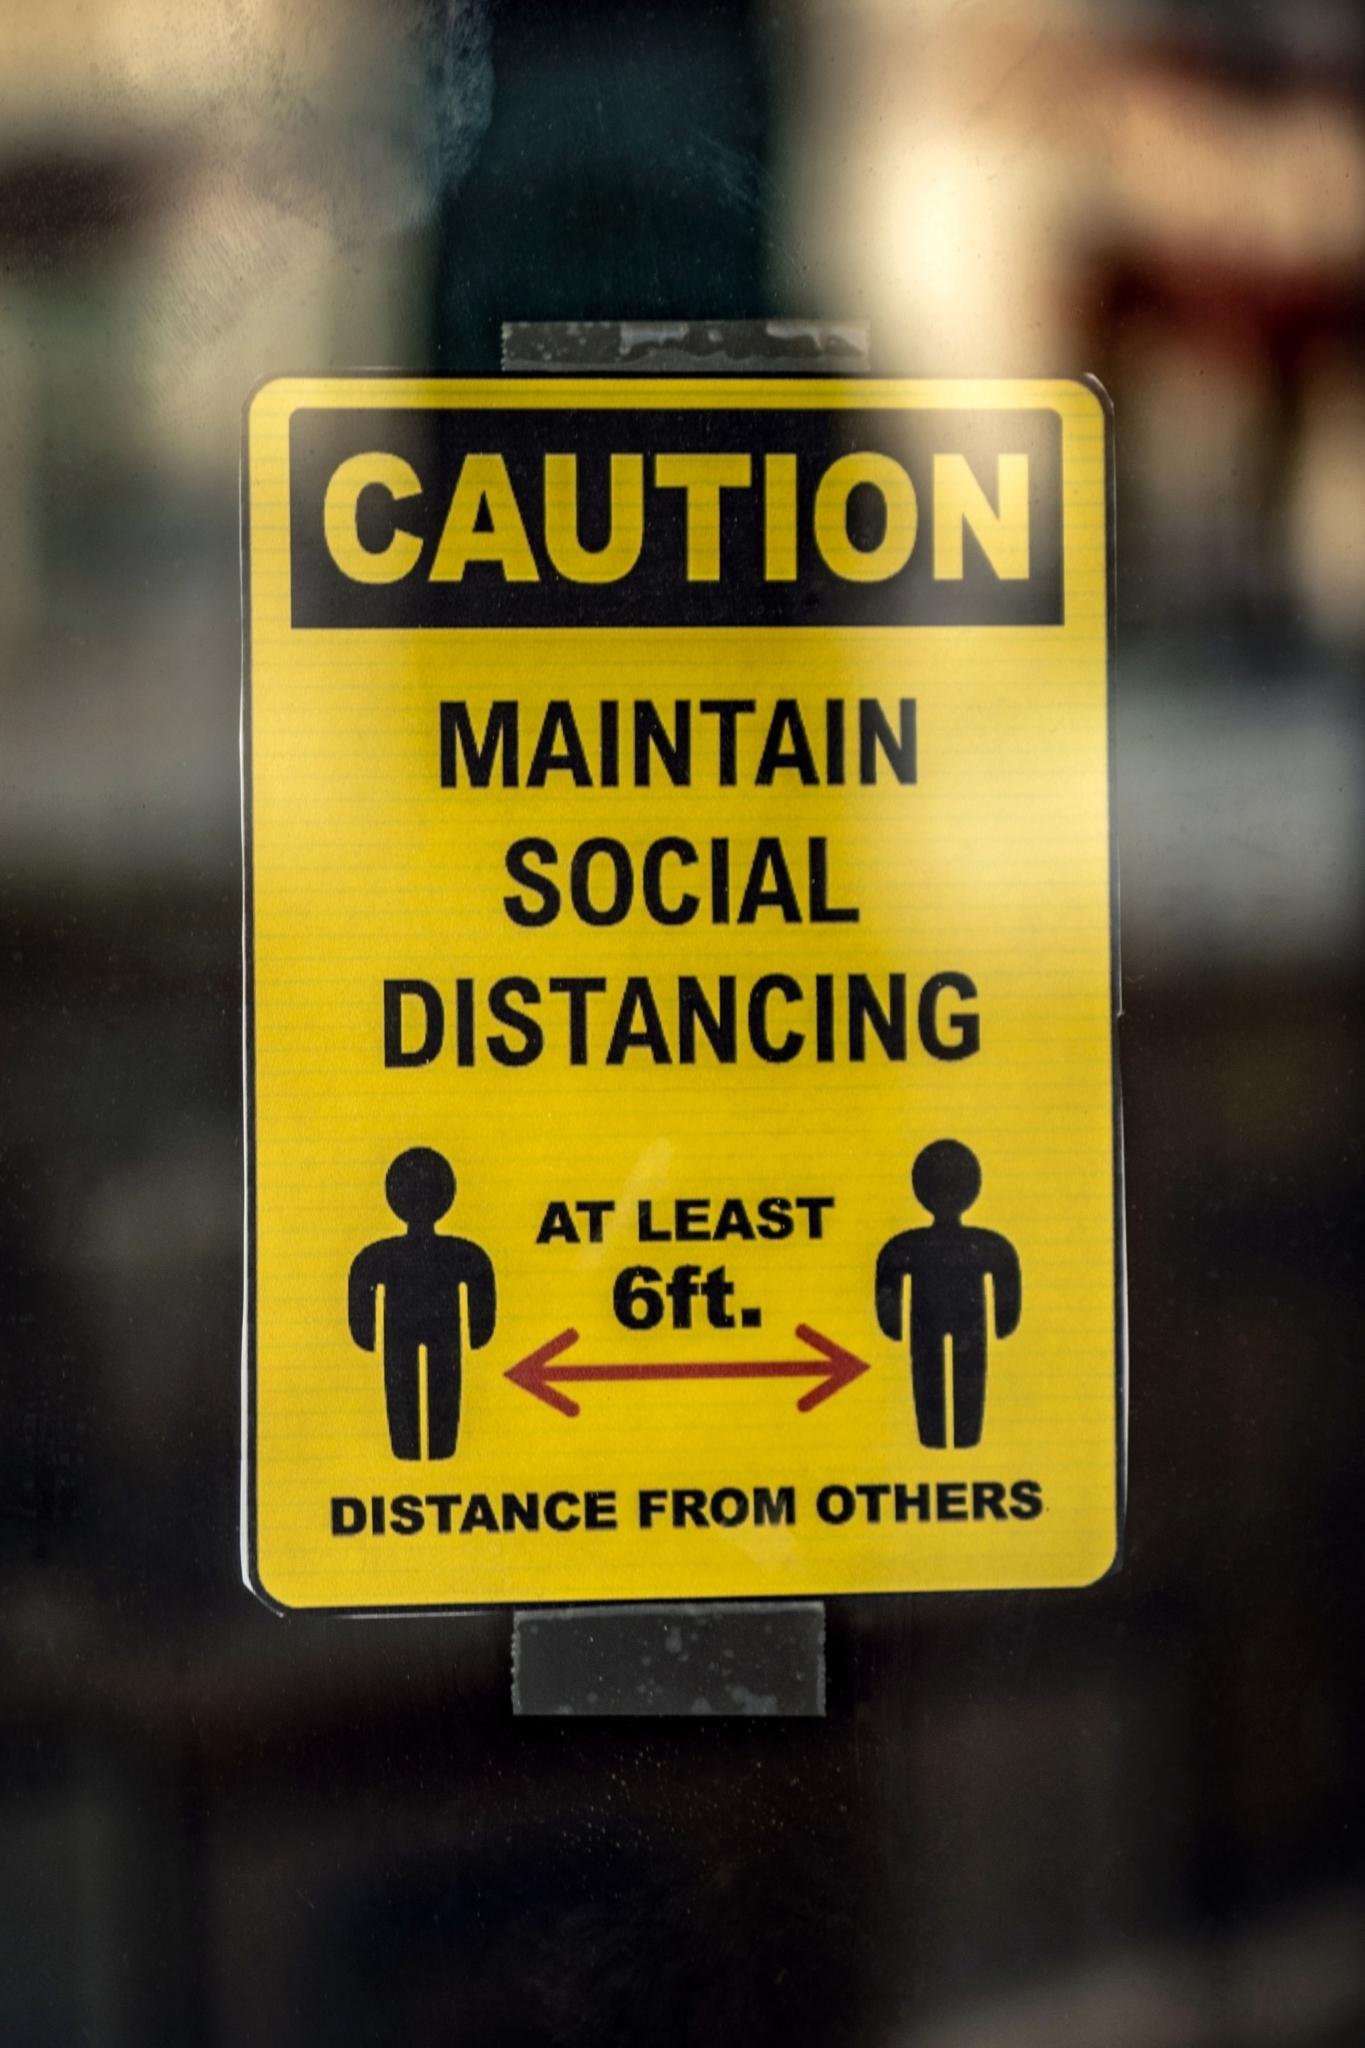 Social distancing 6ft apart